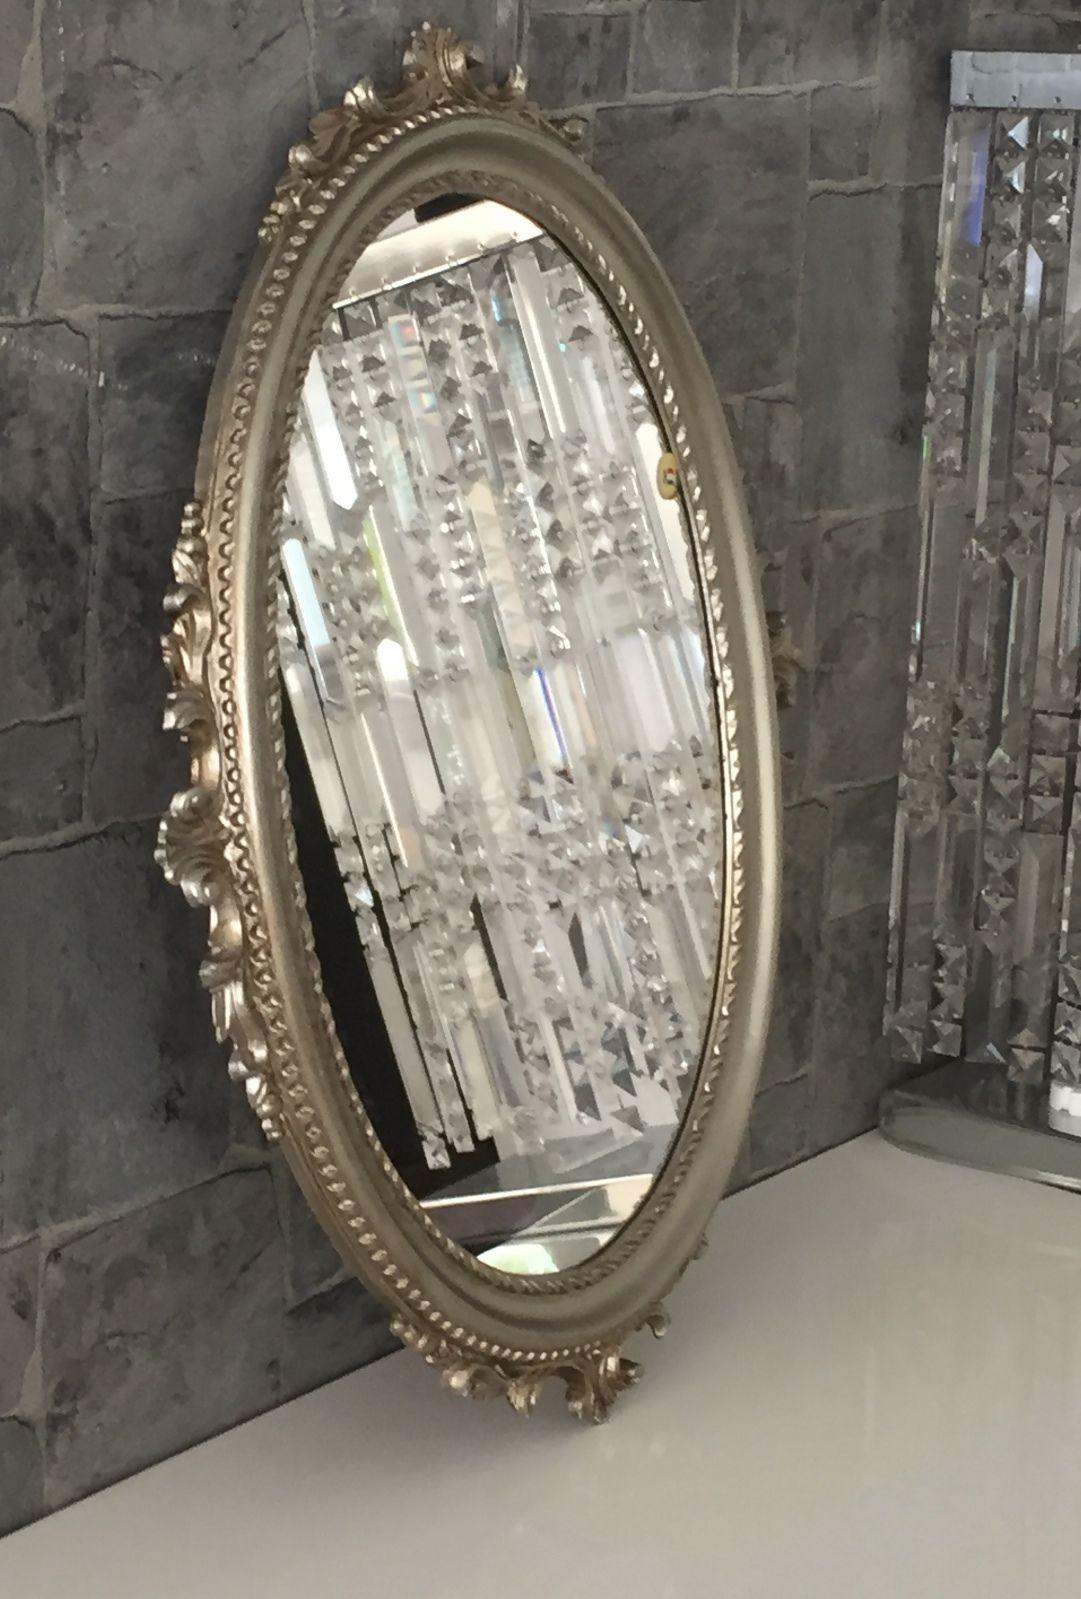 spiegel antik silber great barock modern wandspiegel mit holzrahmen antiksilber x cm neu with. Black Bedroom Furniture Sets. Home Design Ideas